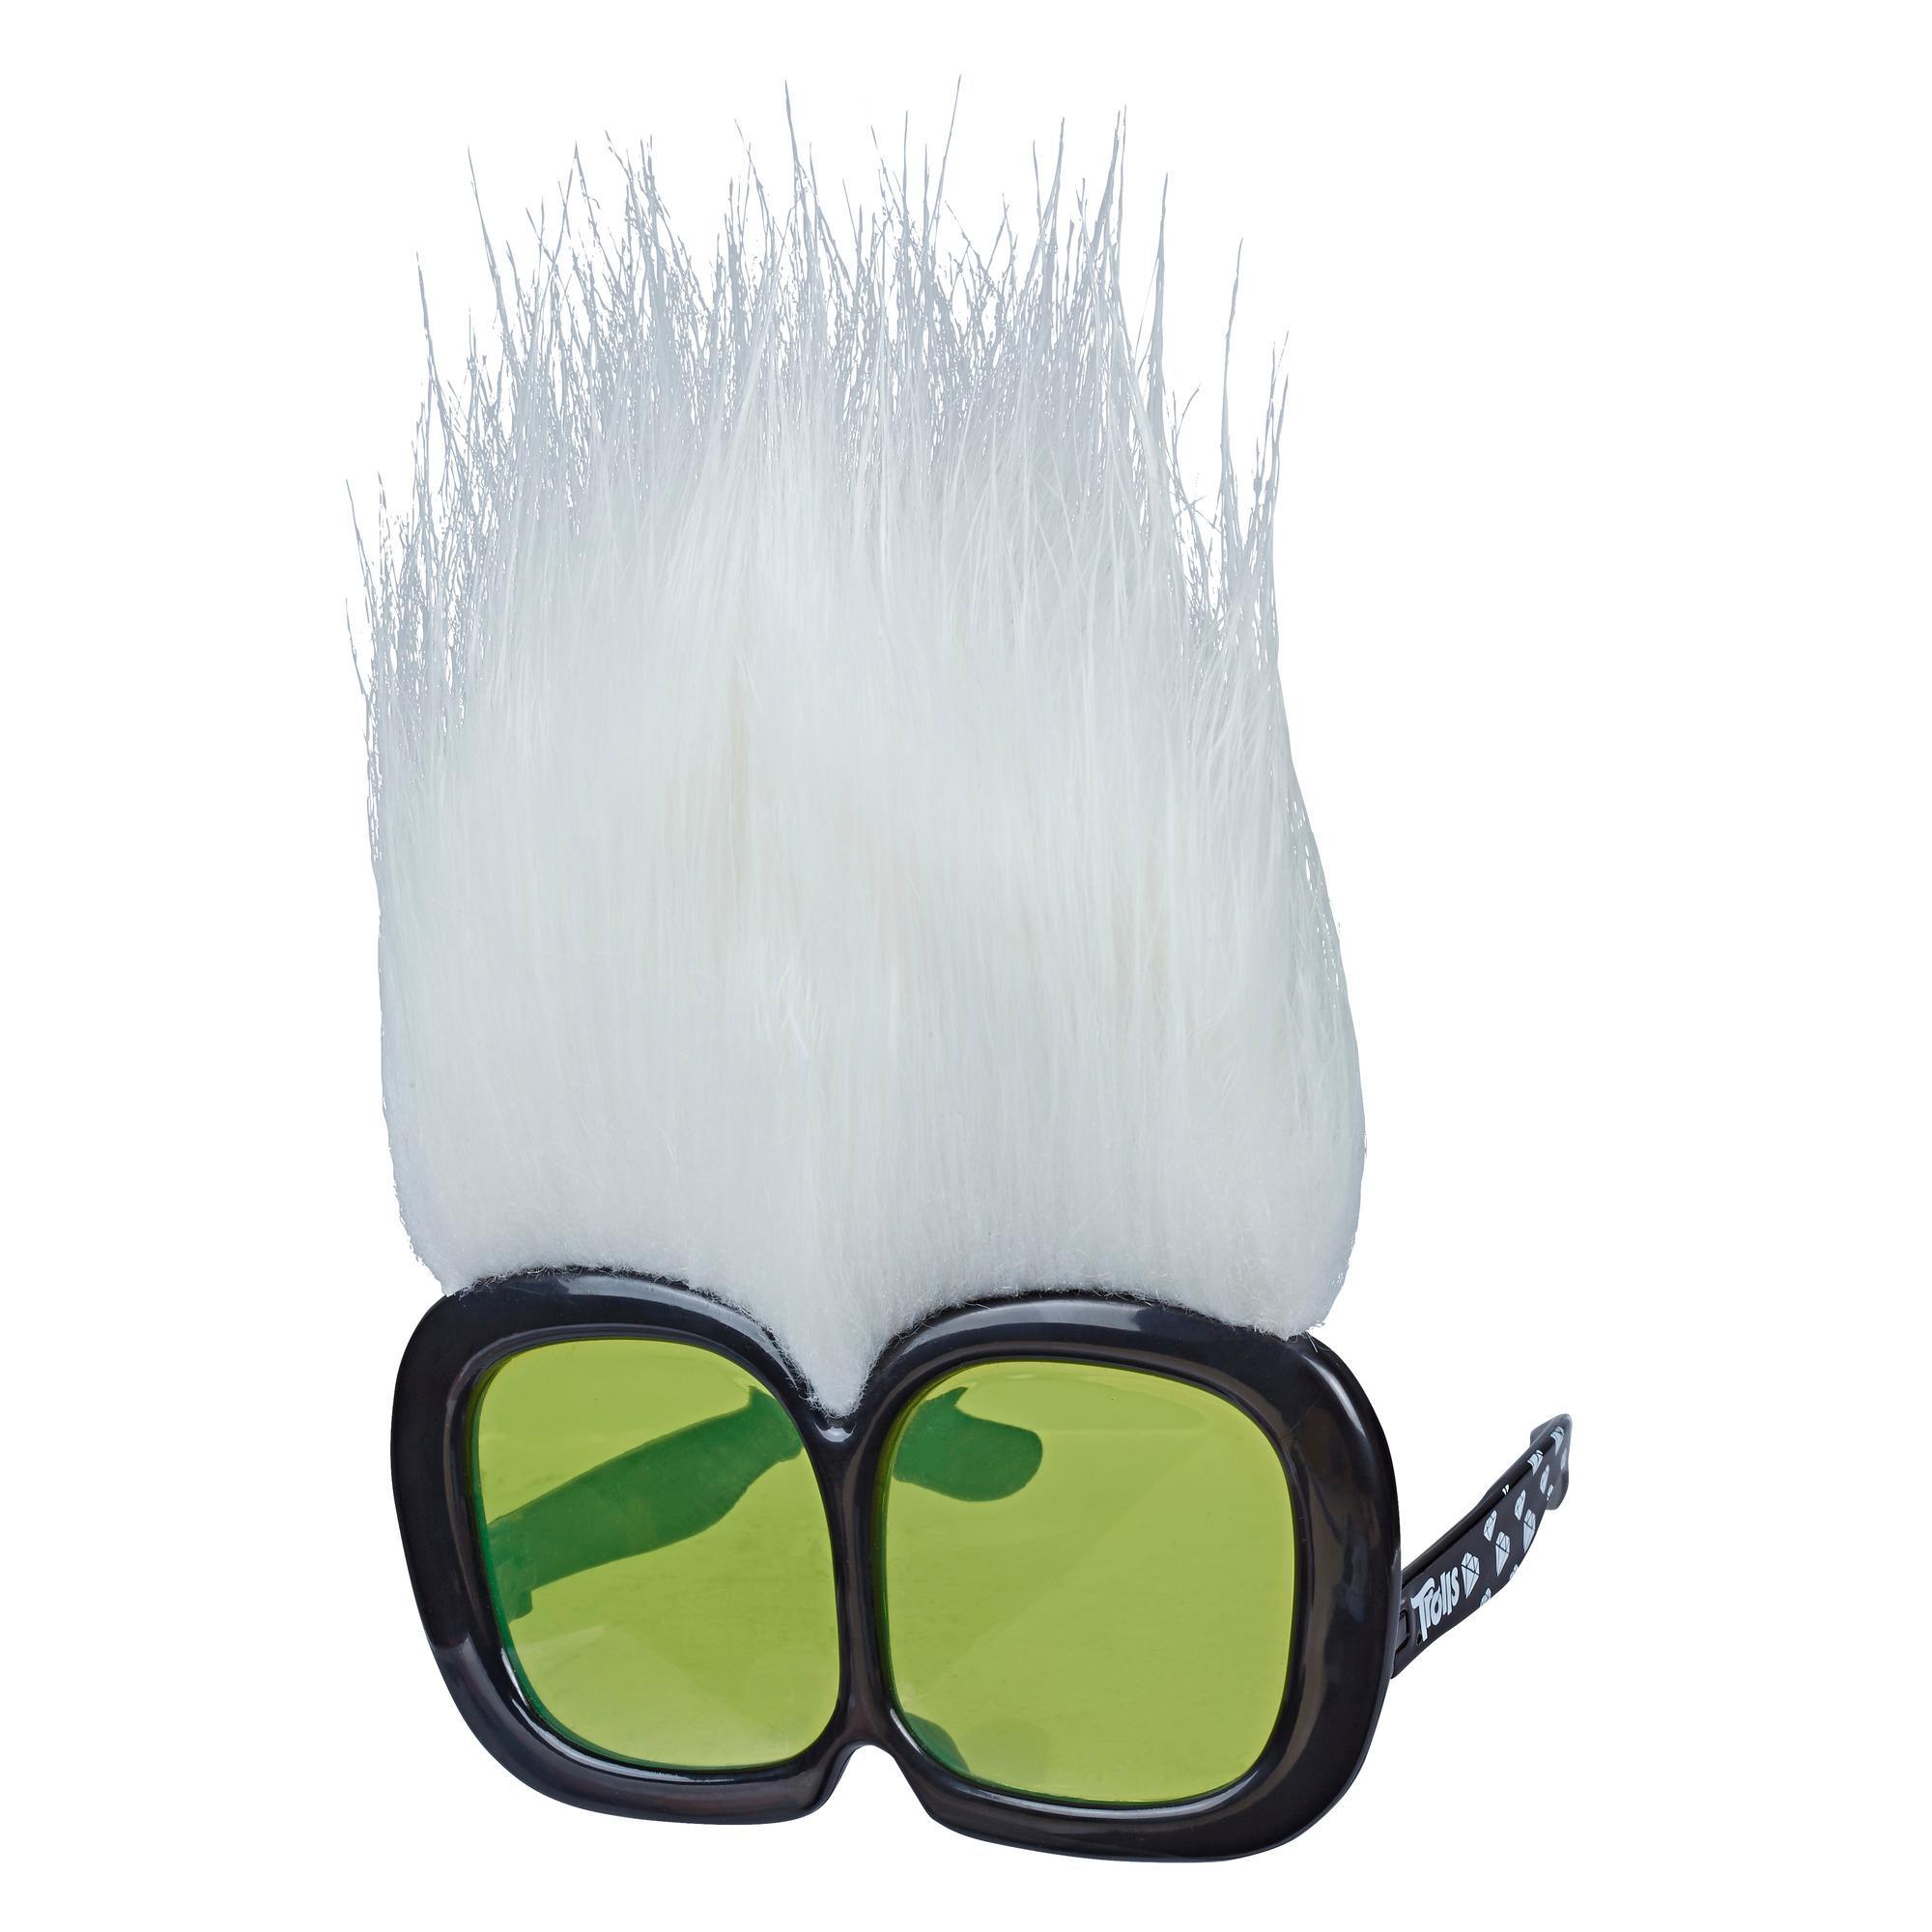 DreamWorks Trolls Tiny Diamond's Rockin' Shades, Fun Sunglasses Toy inspired by the Movie Trolls World Tour